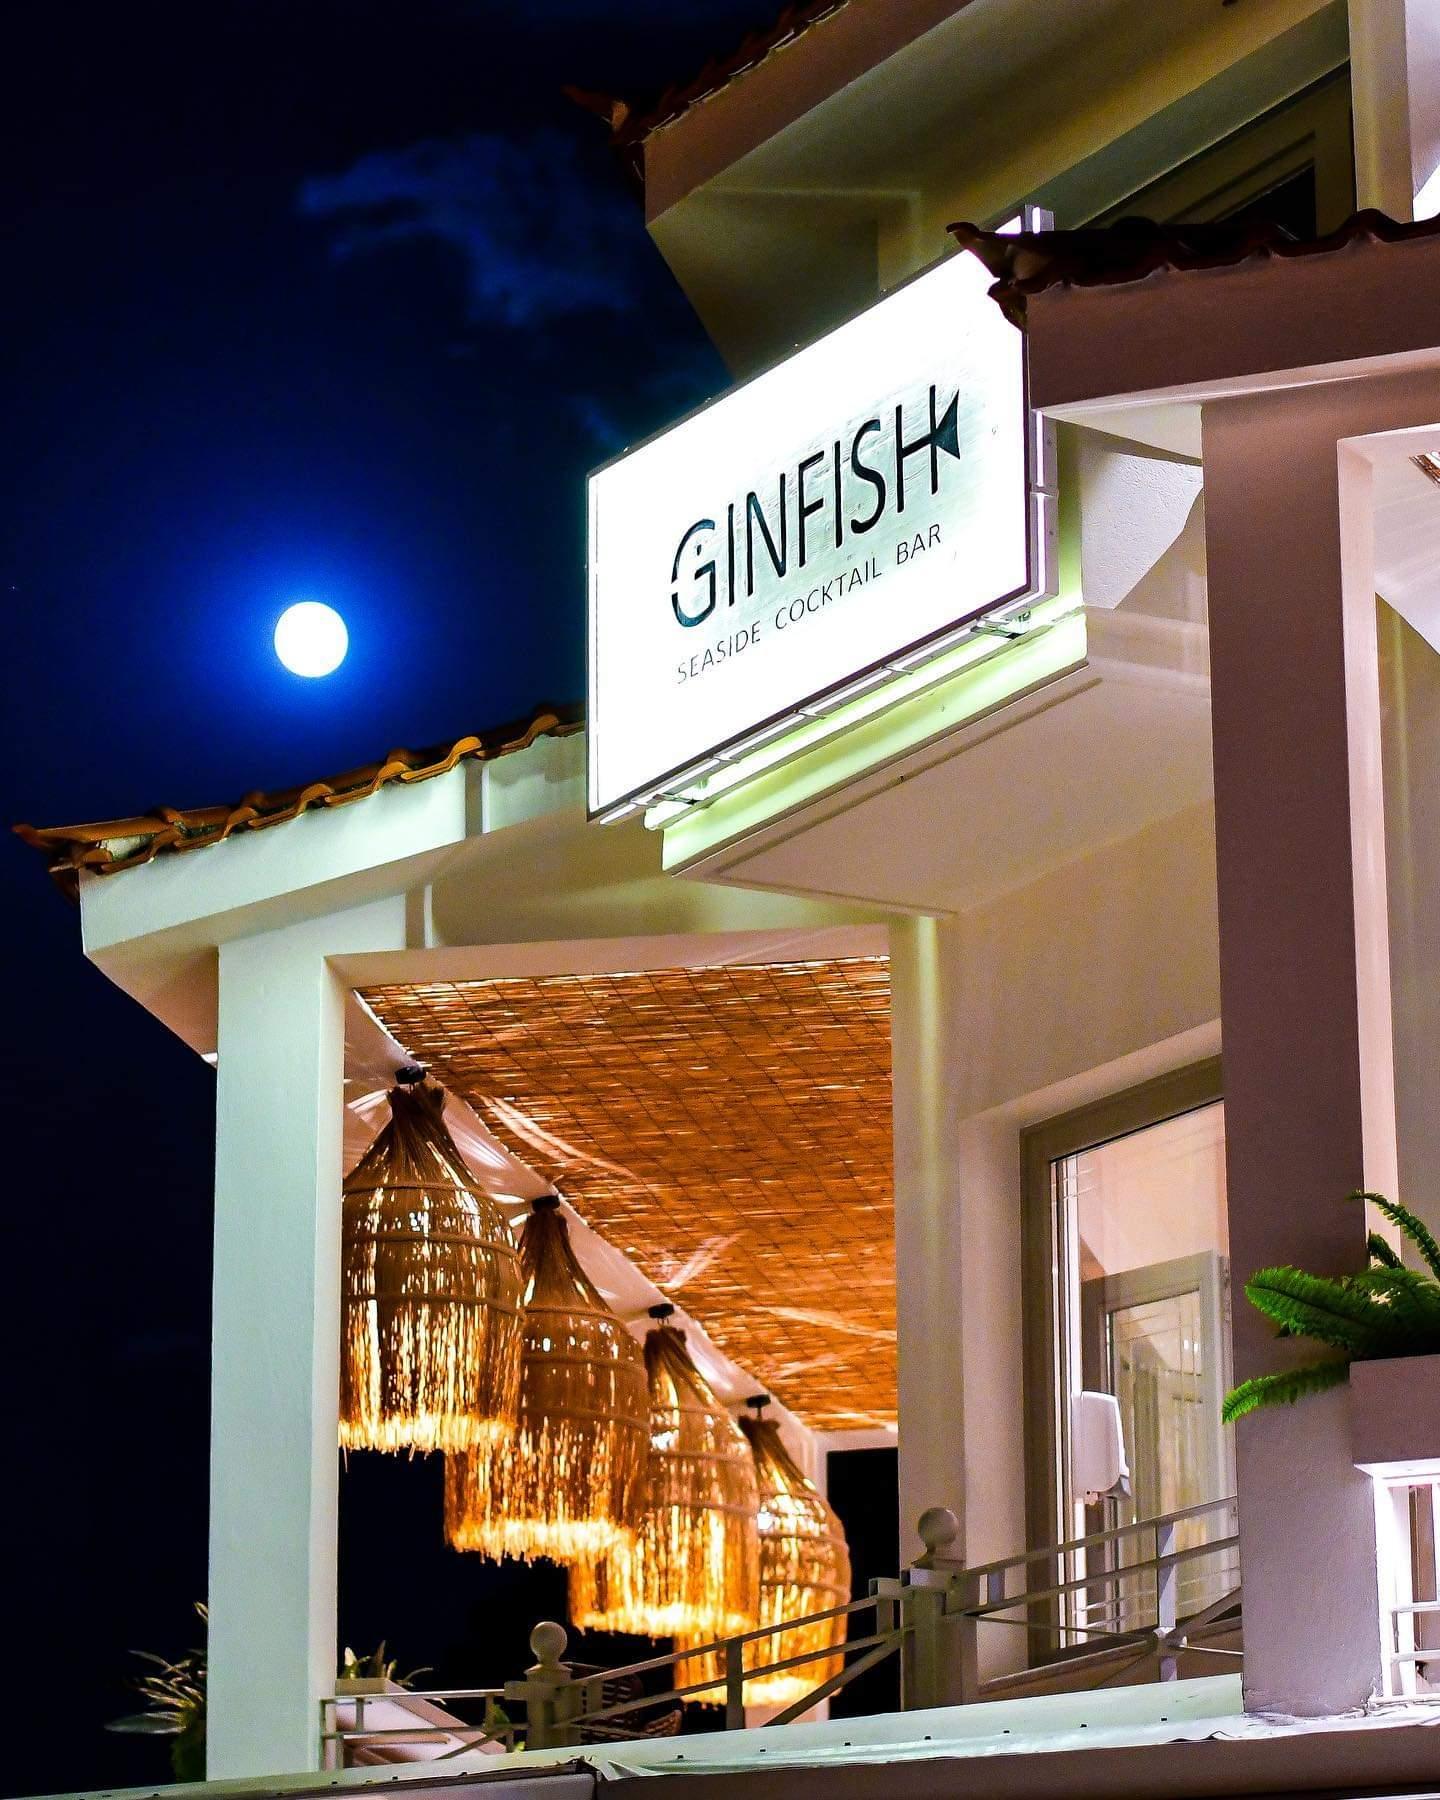 GinFish